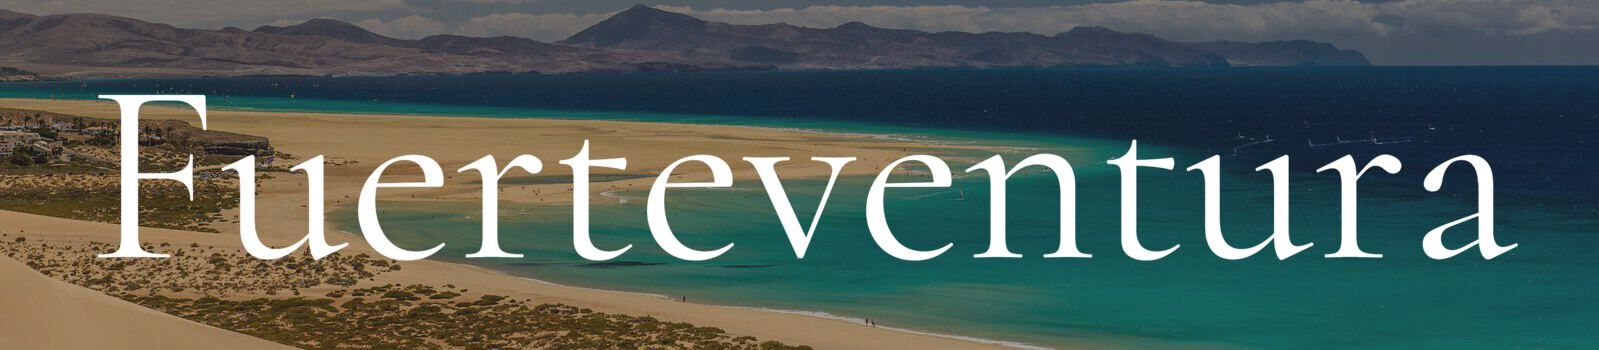 Découverte de Fuerteventura